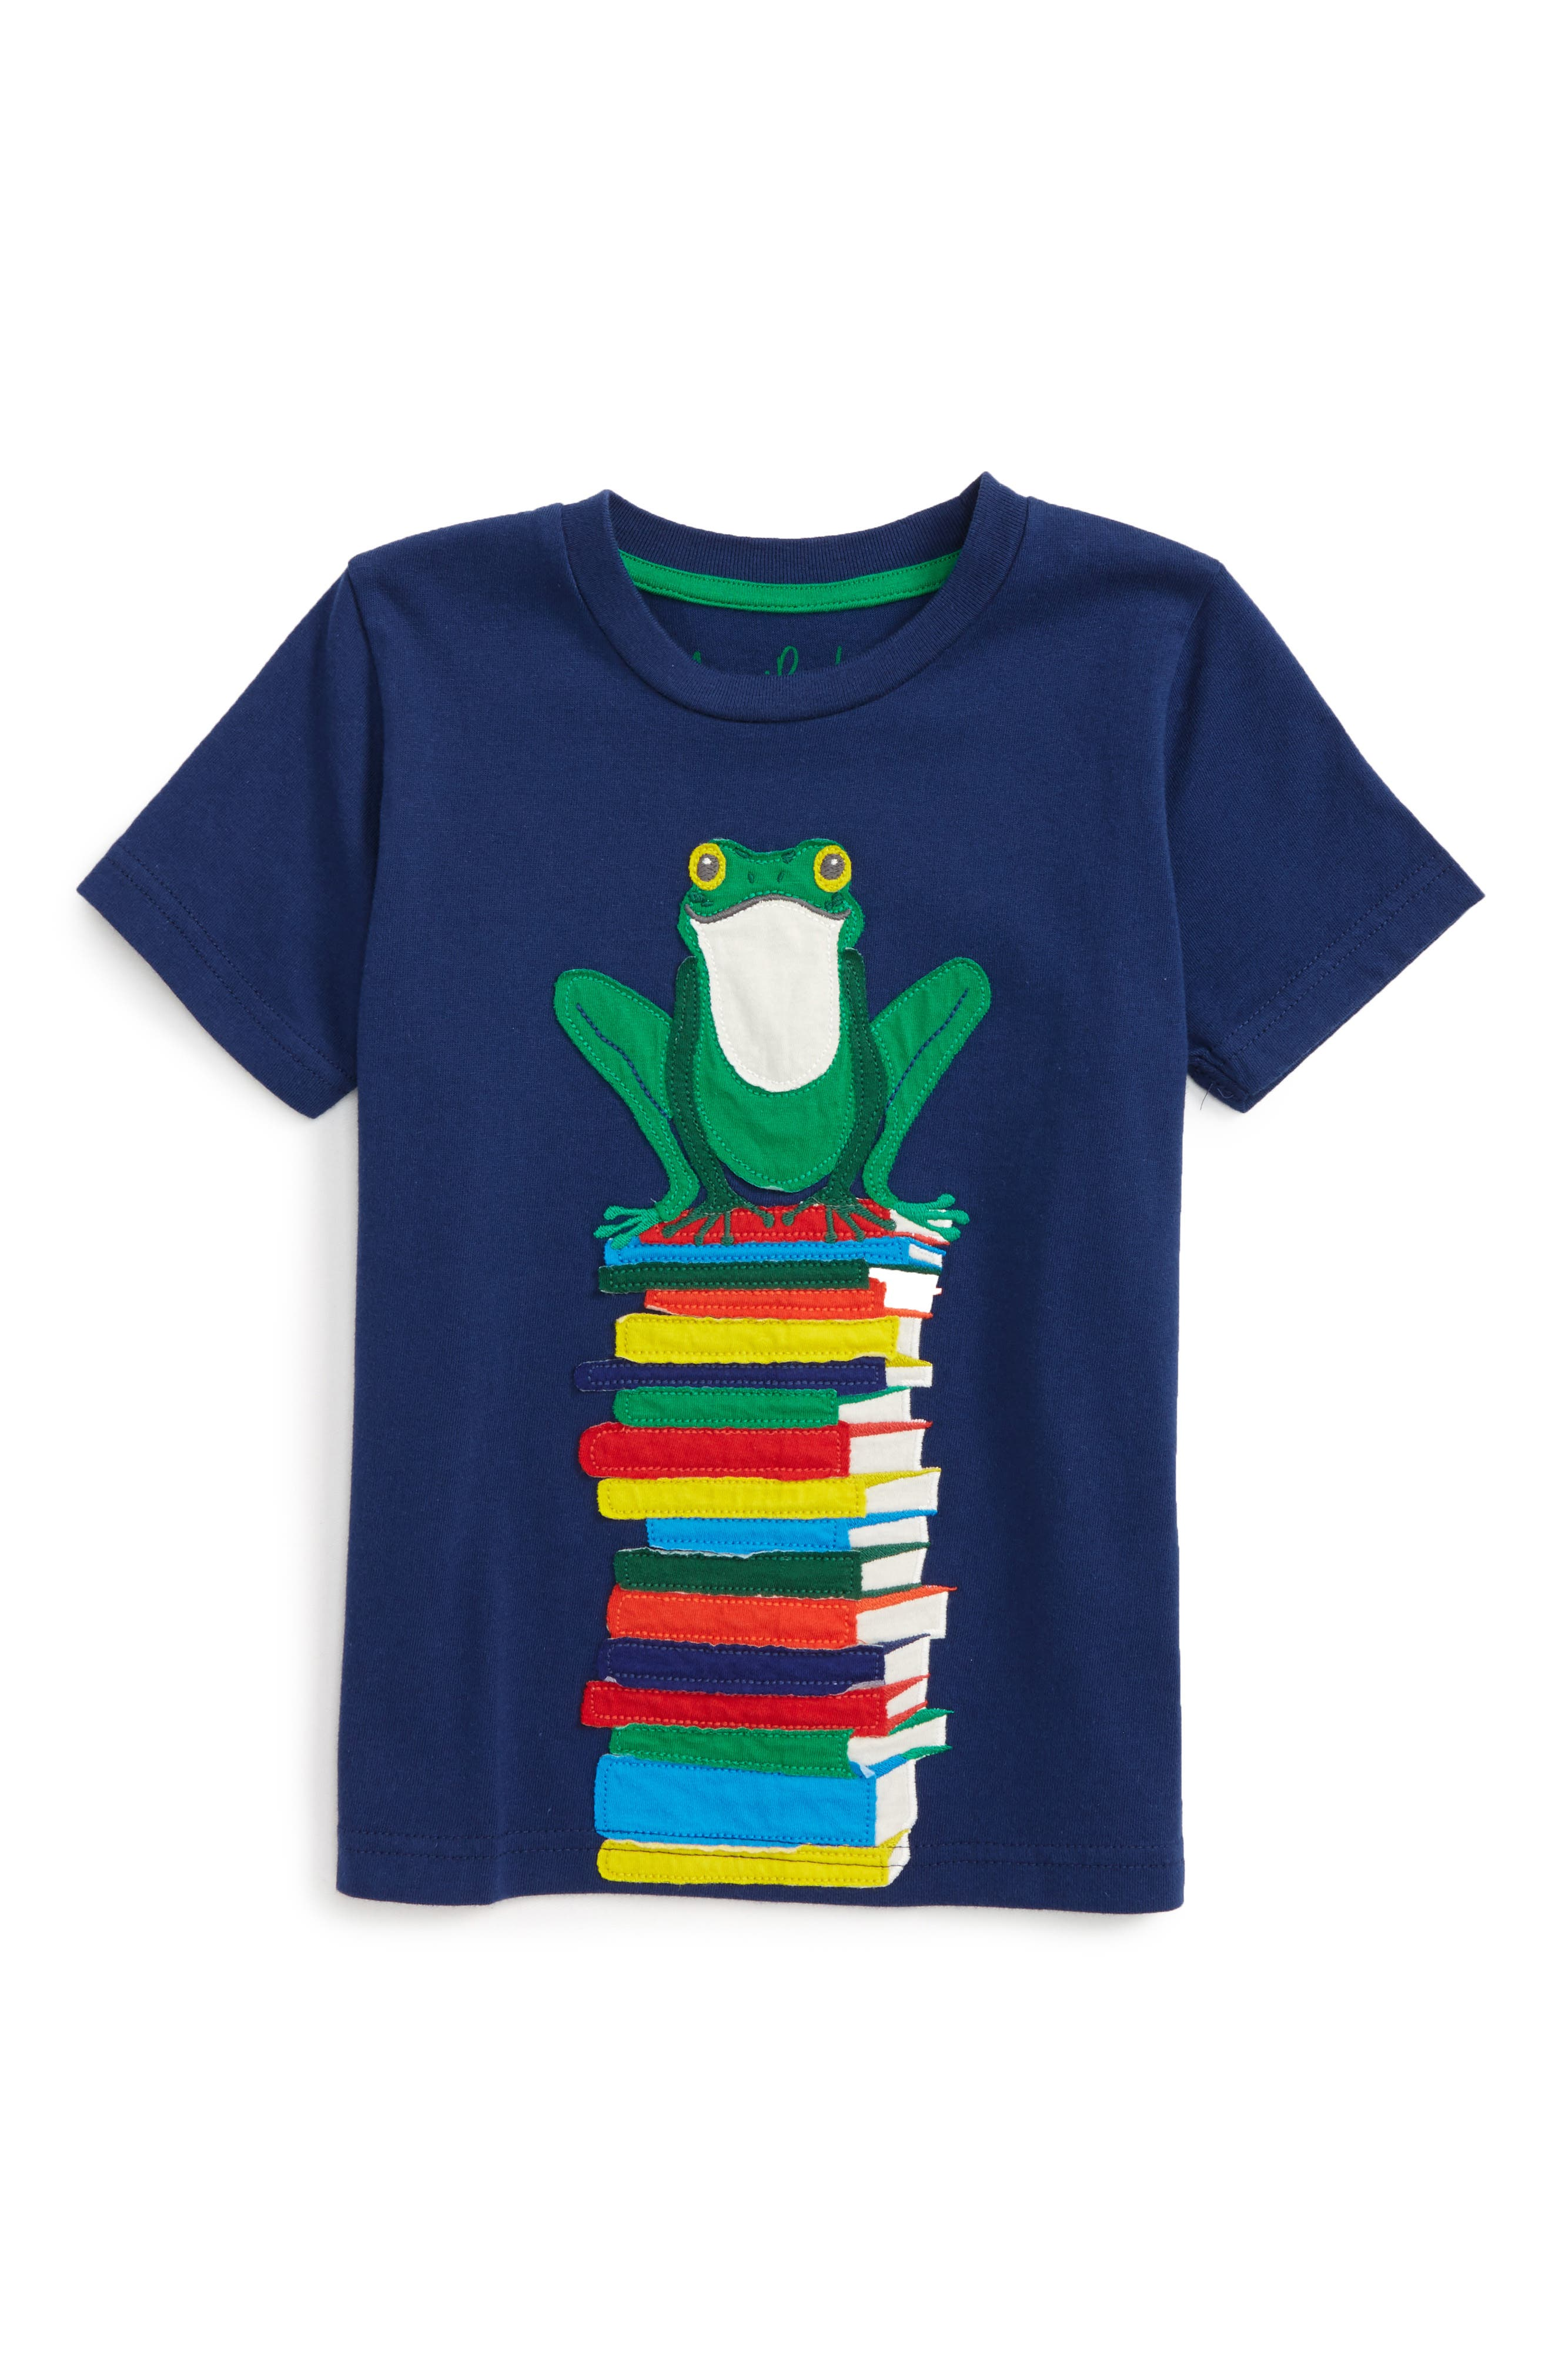 Main Image - Mini Boden Big Appliqué T-Shirt (Toddler Boys, Little Boys & Big Boys)